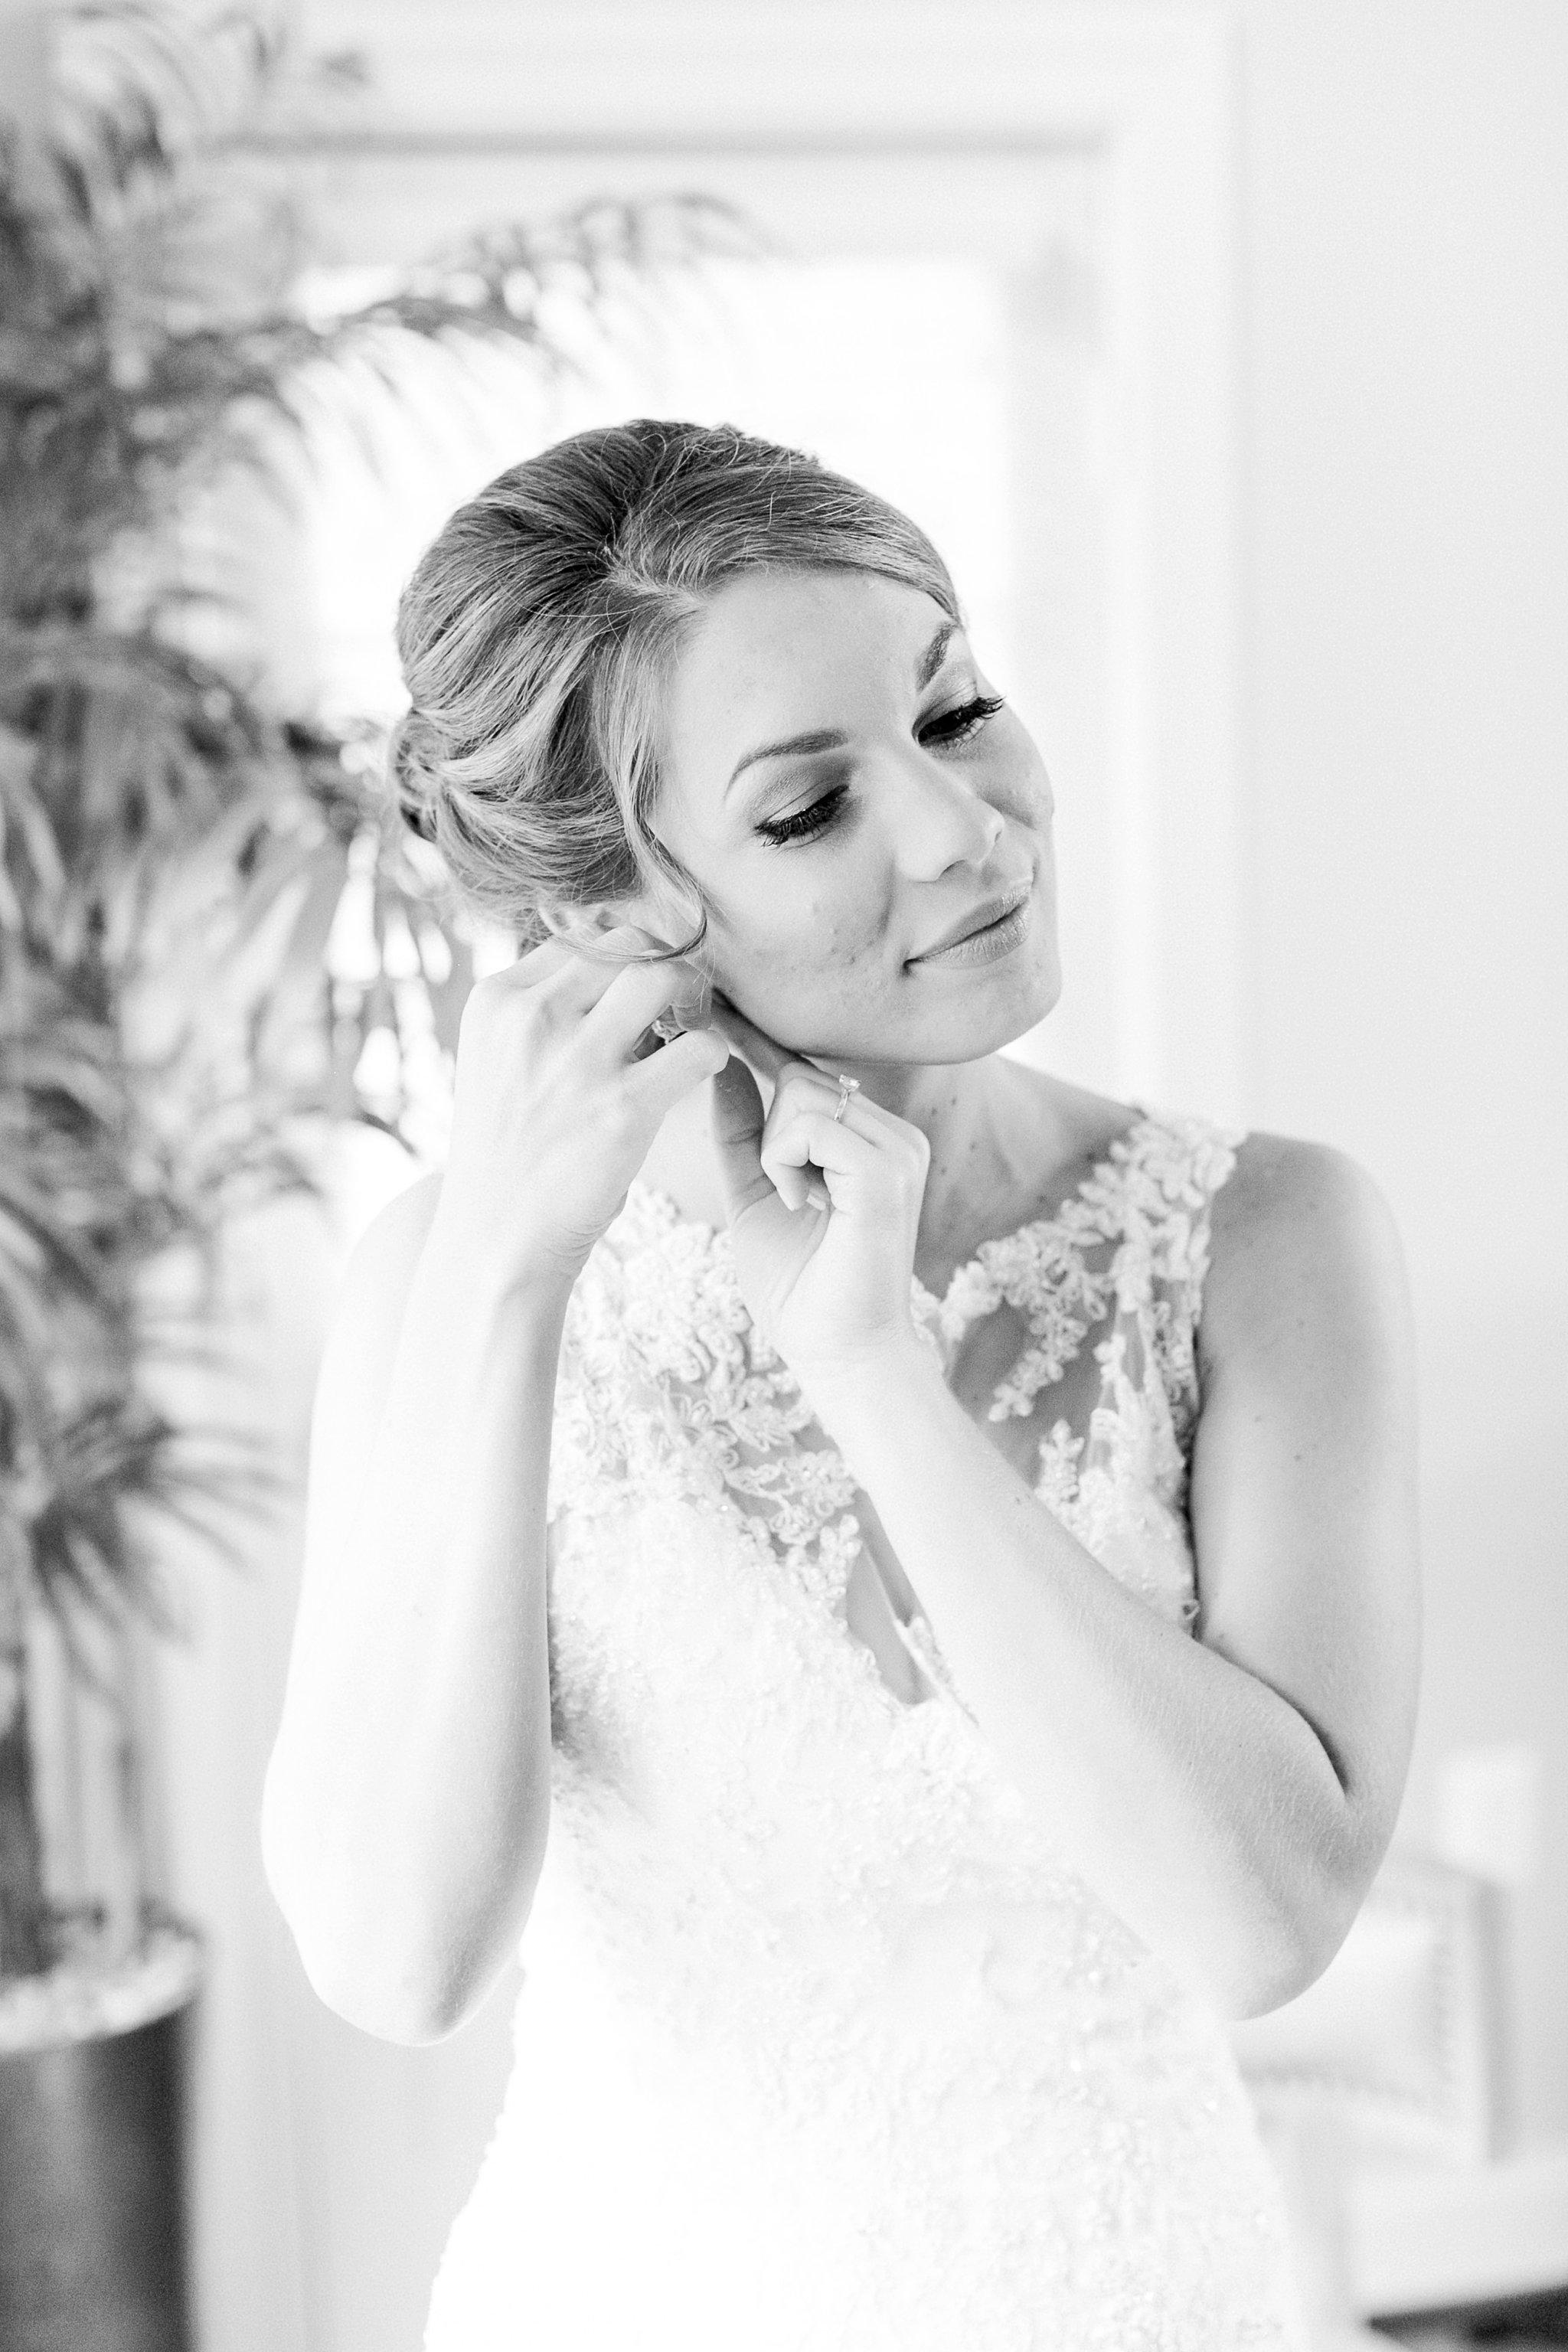 Stone Tower Winery Wedding Photos Virginia Wedding Photographer Megan Kelsey Photography Sam & Angela-47.jpg